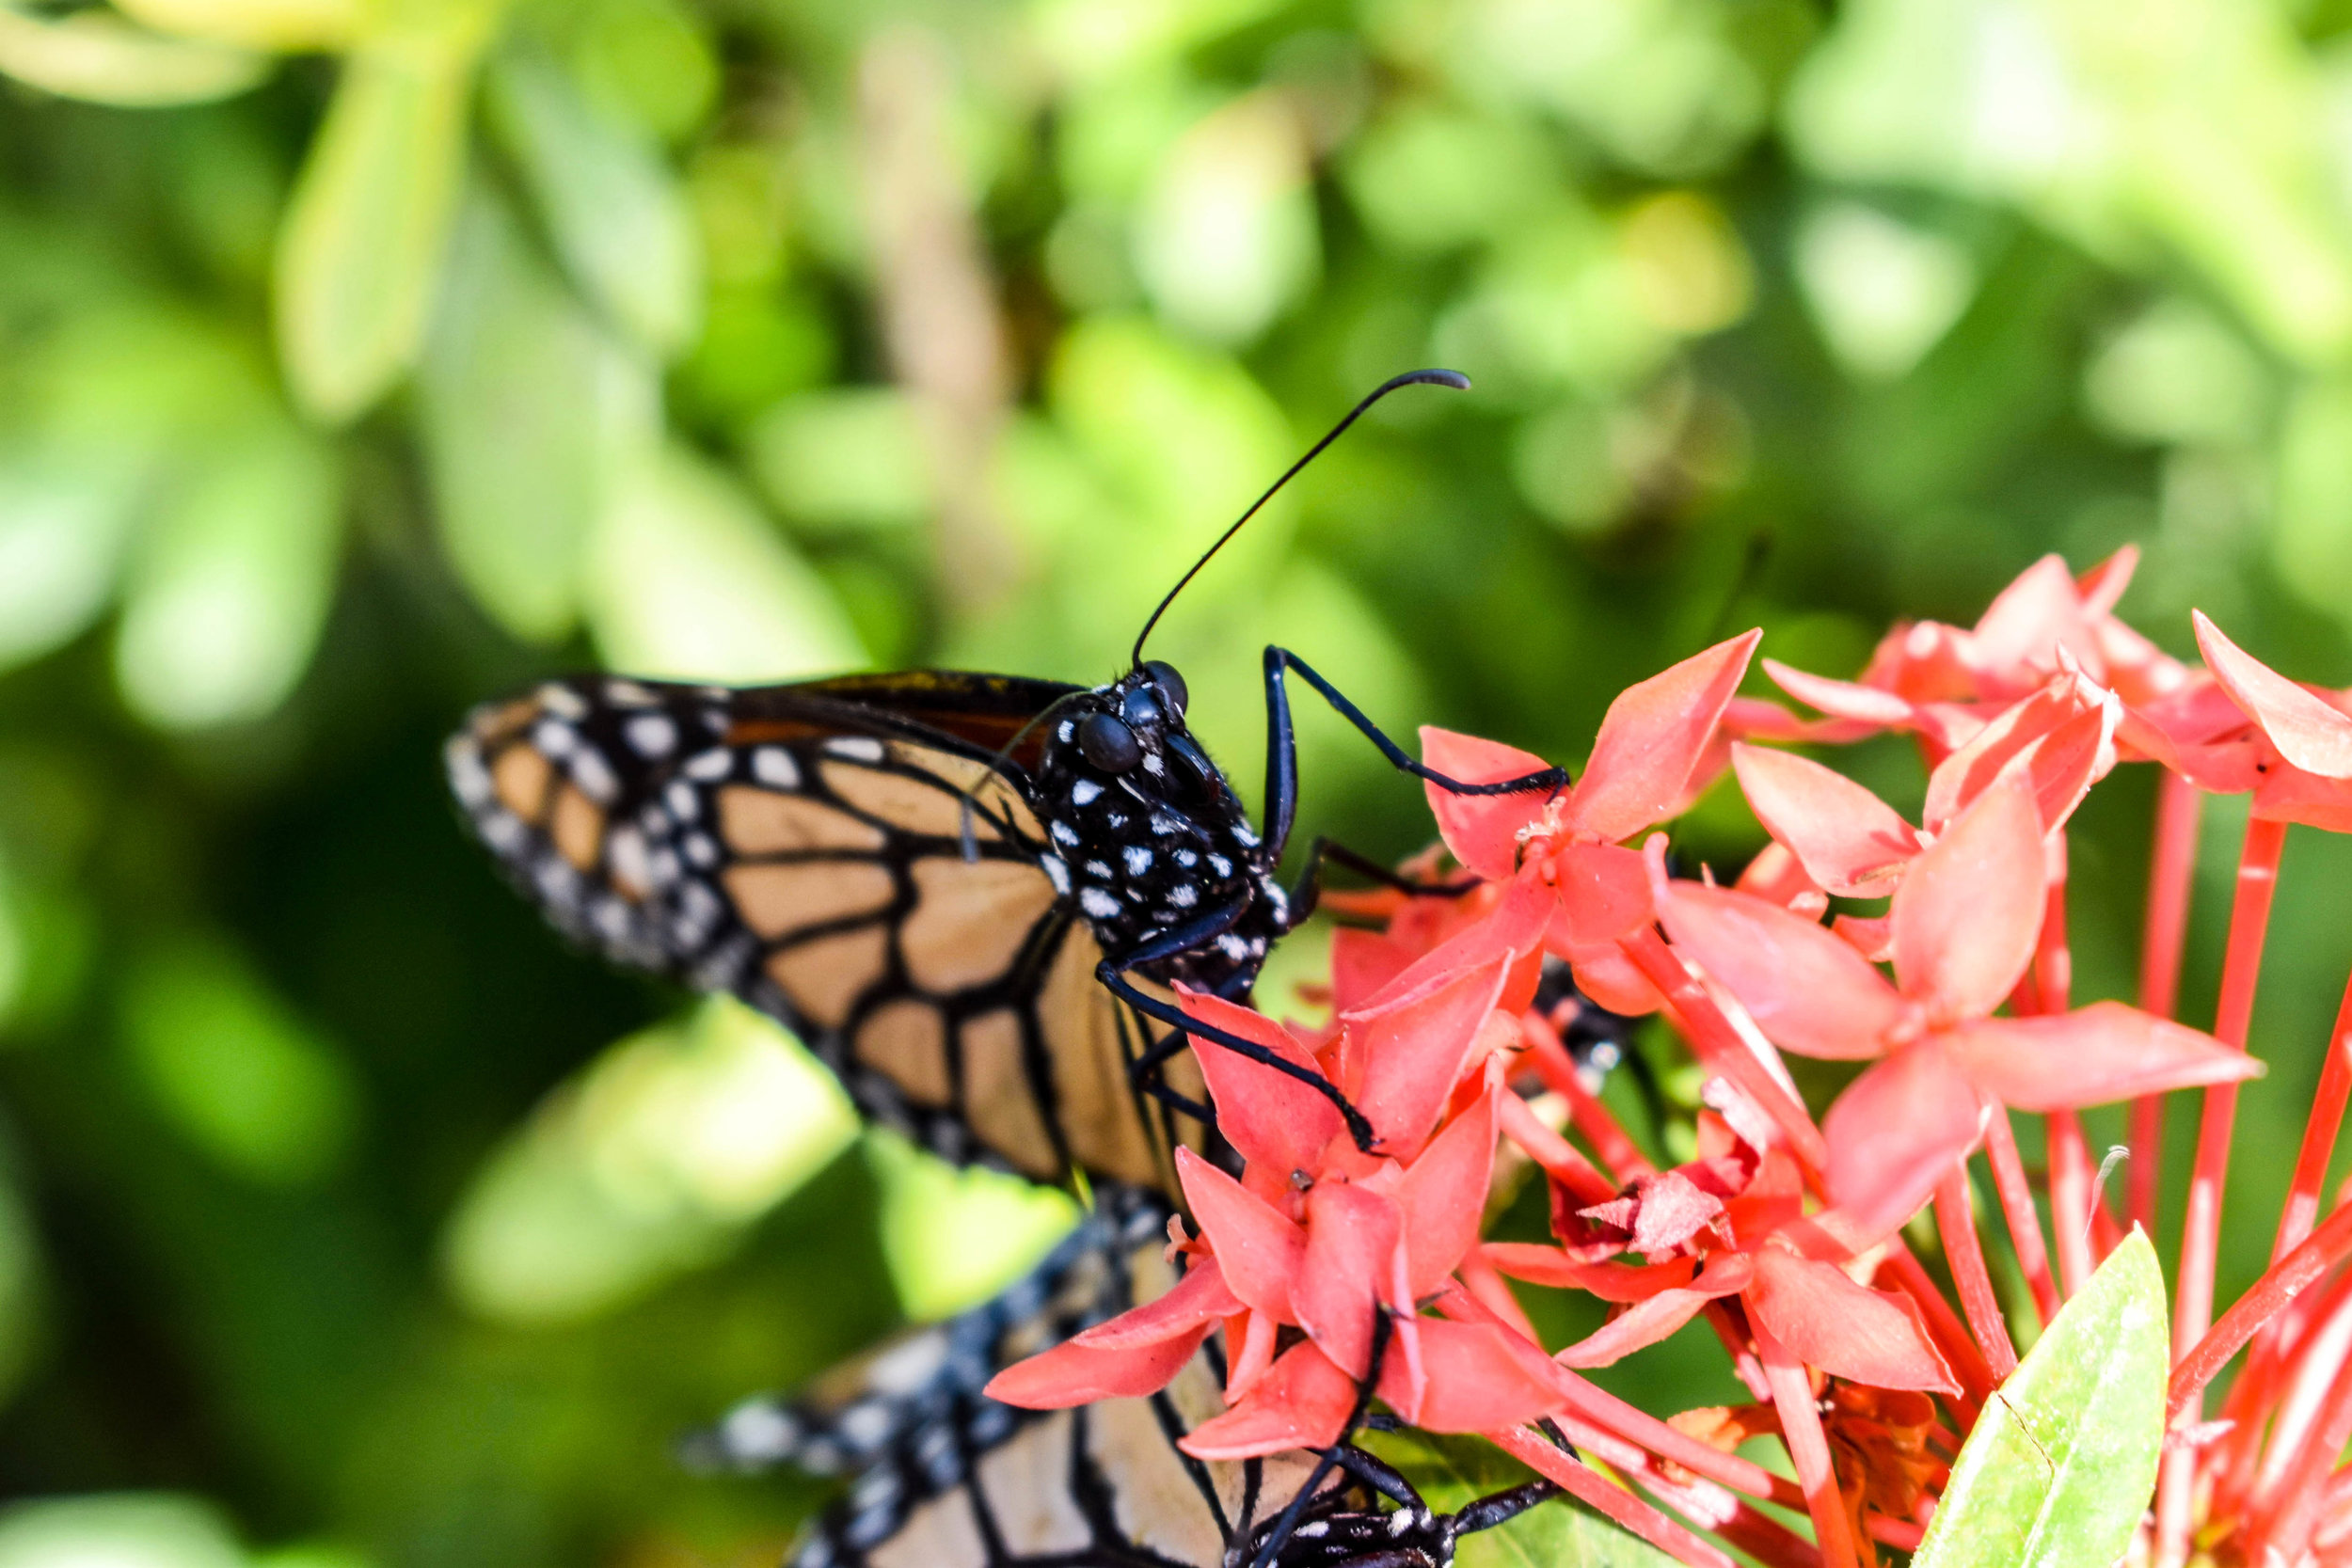 The Butterfly Garden in Reserva Charco Verde, Nicaragua